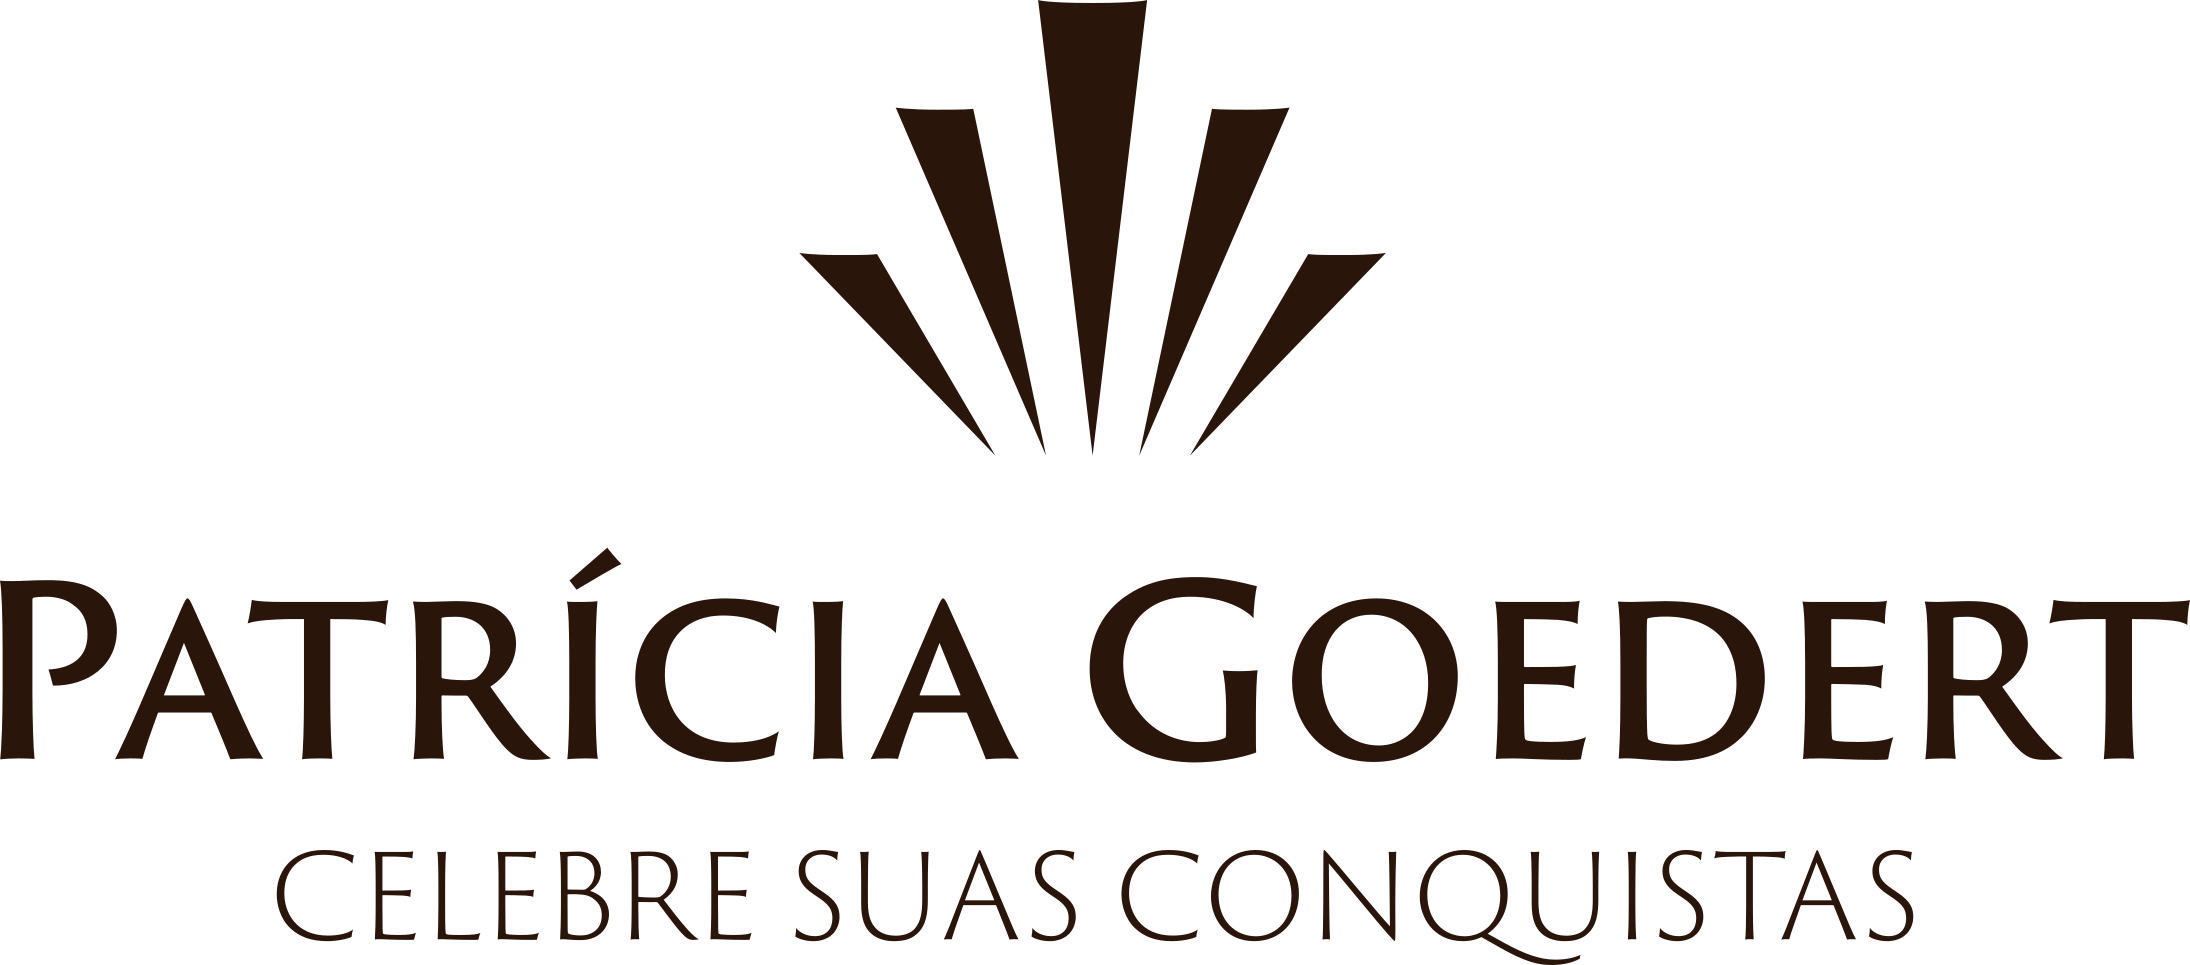 Patricia Goedert Doçaria